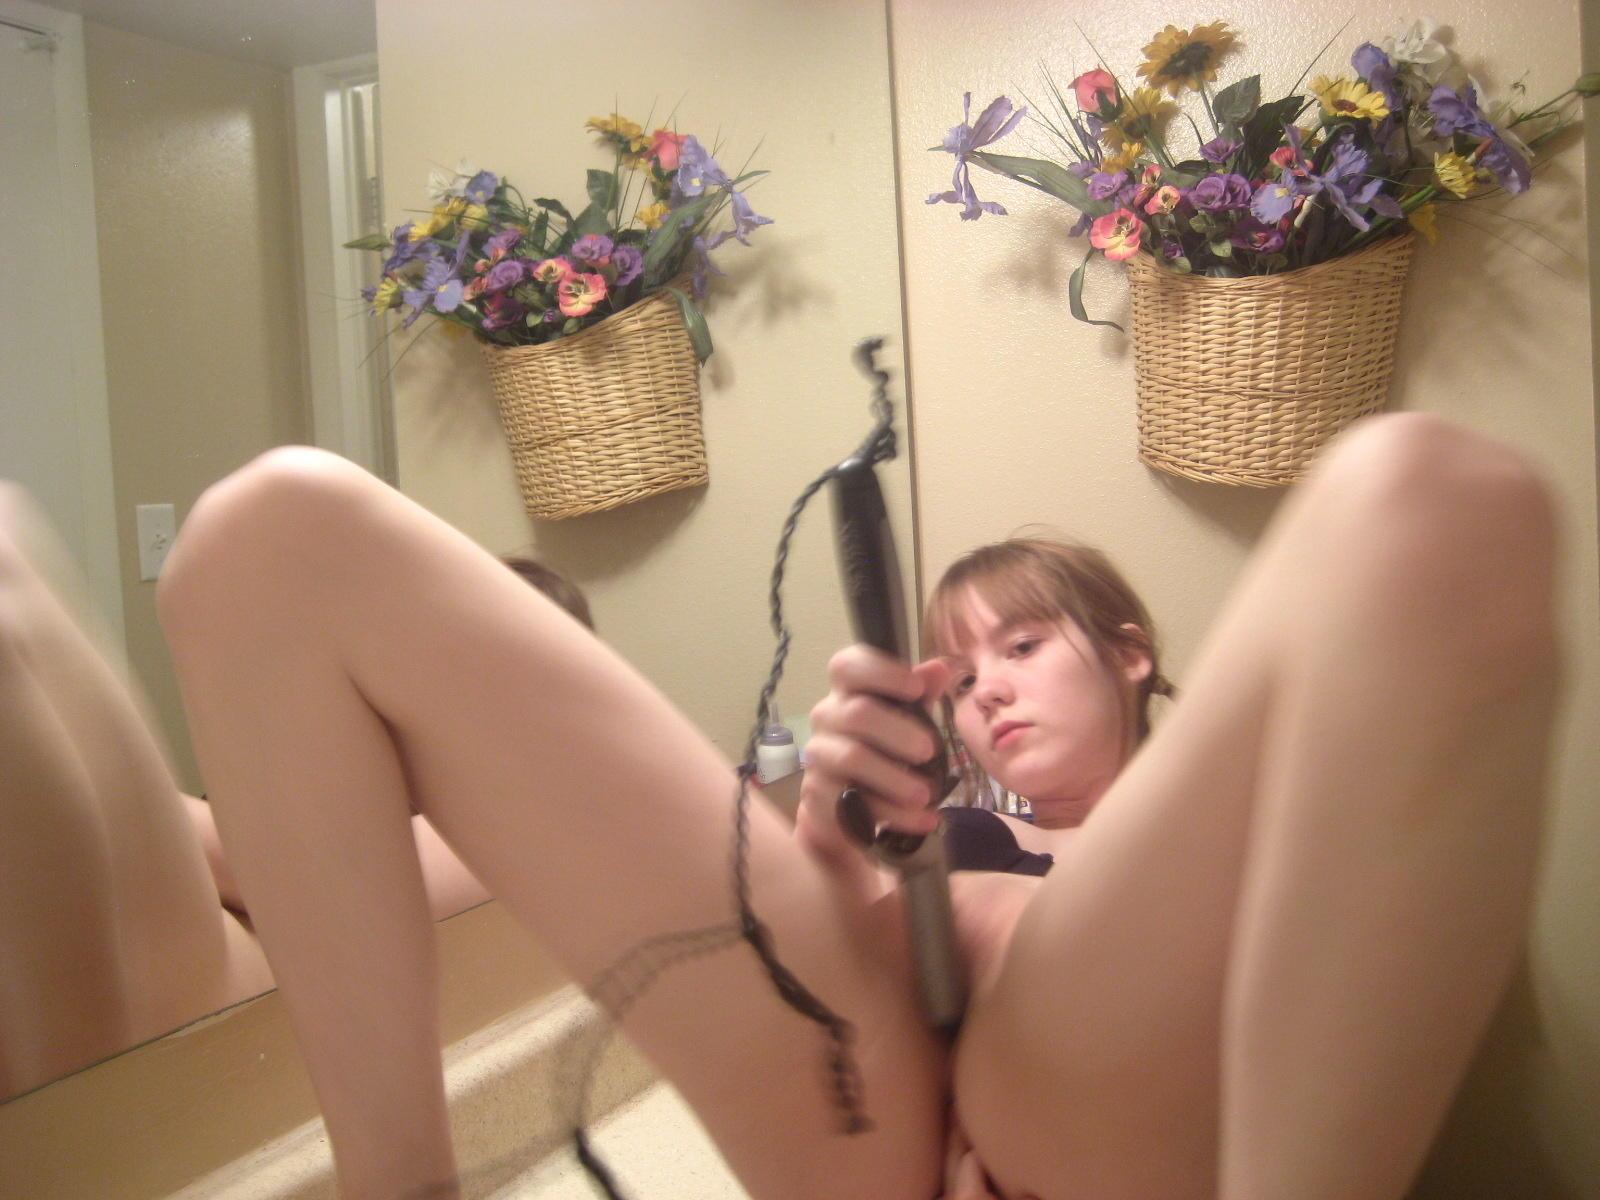 phat booty wide hip slut pics